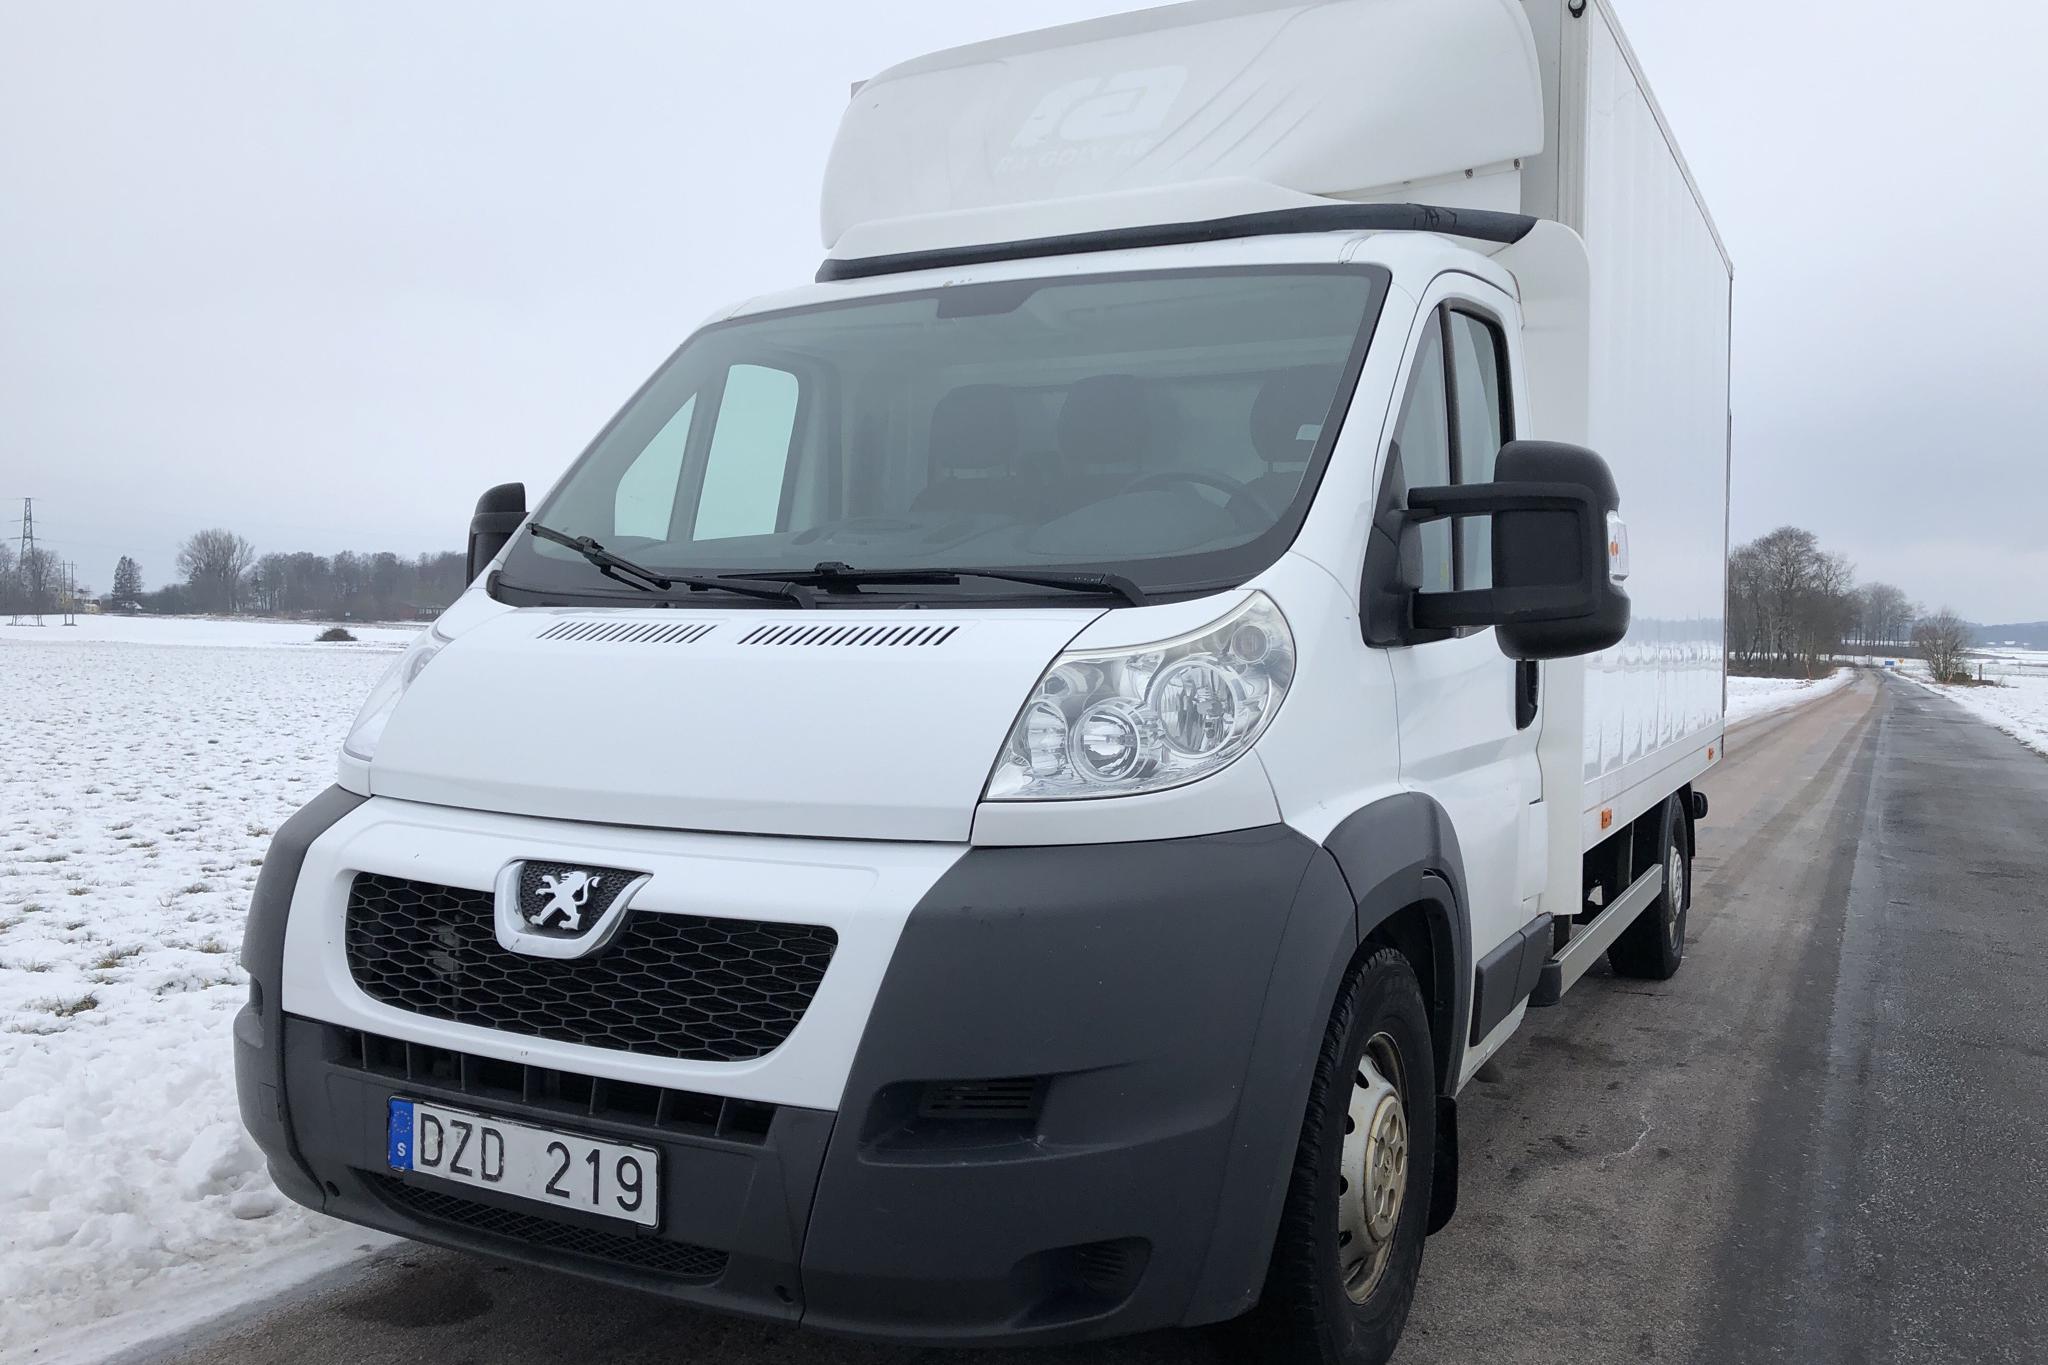 Peugeot Boxer 2.2 HDI Volymskåp (130hk) - 112 890 km - Manual - white - 2013